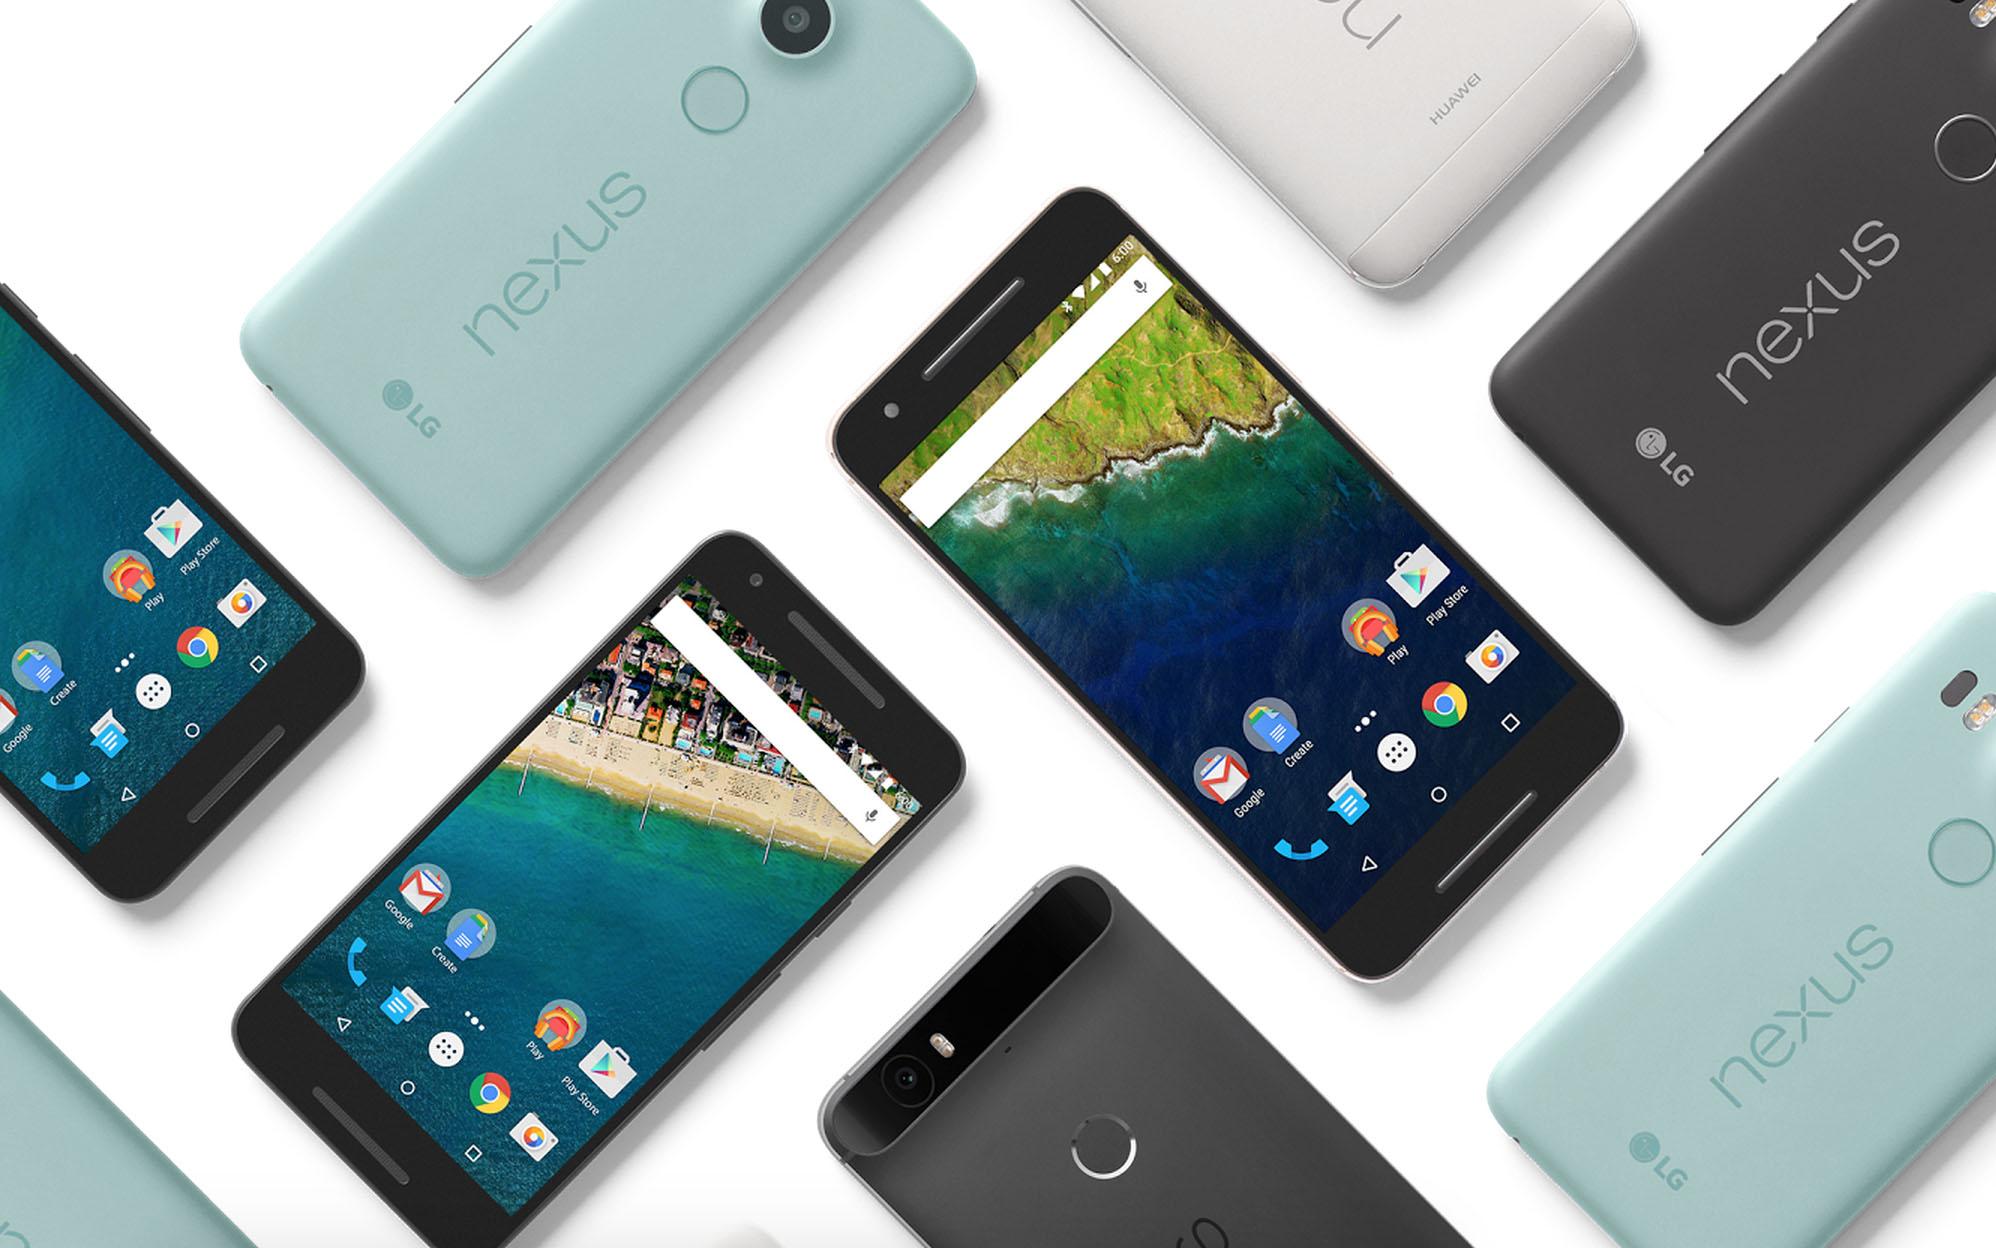 versiuni noi de Android